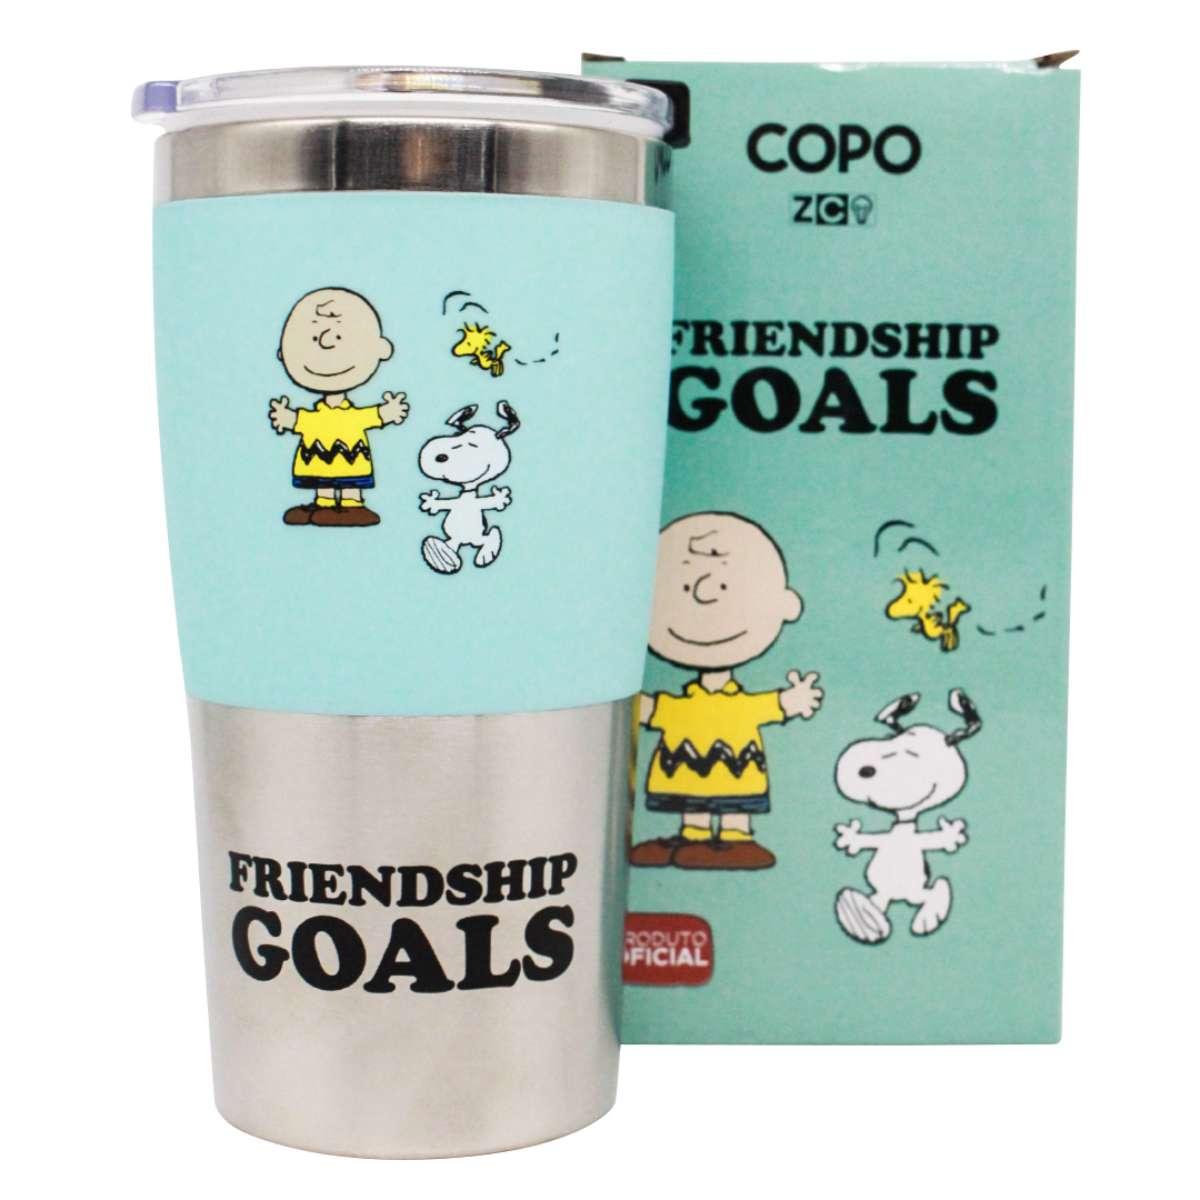 Copo Viagem Snoopy Friendship Goals Charlie Brown Amizade